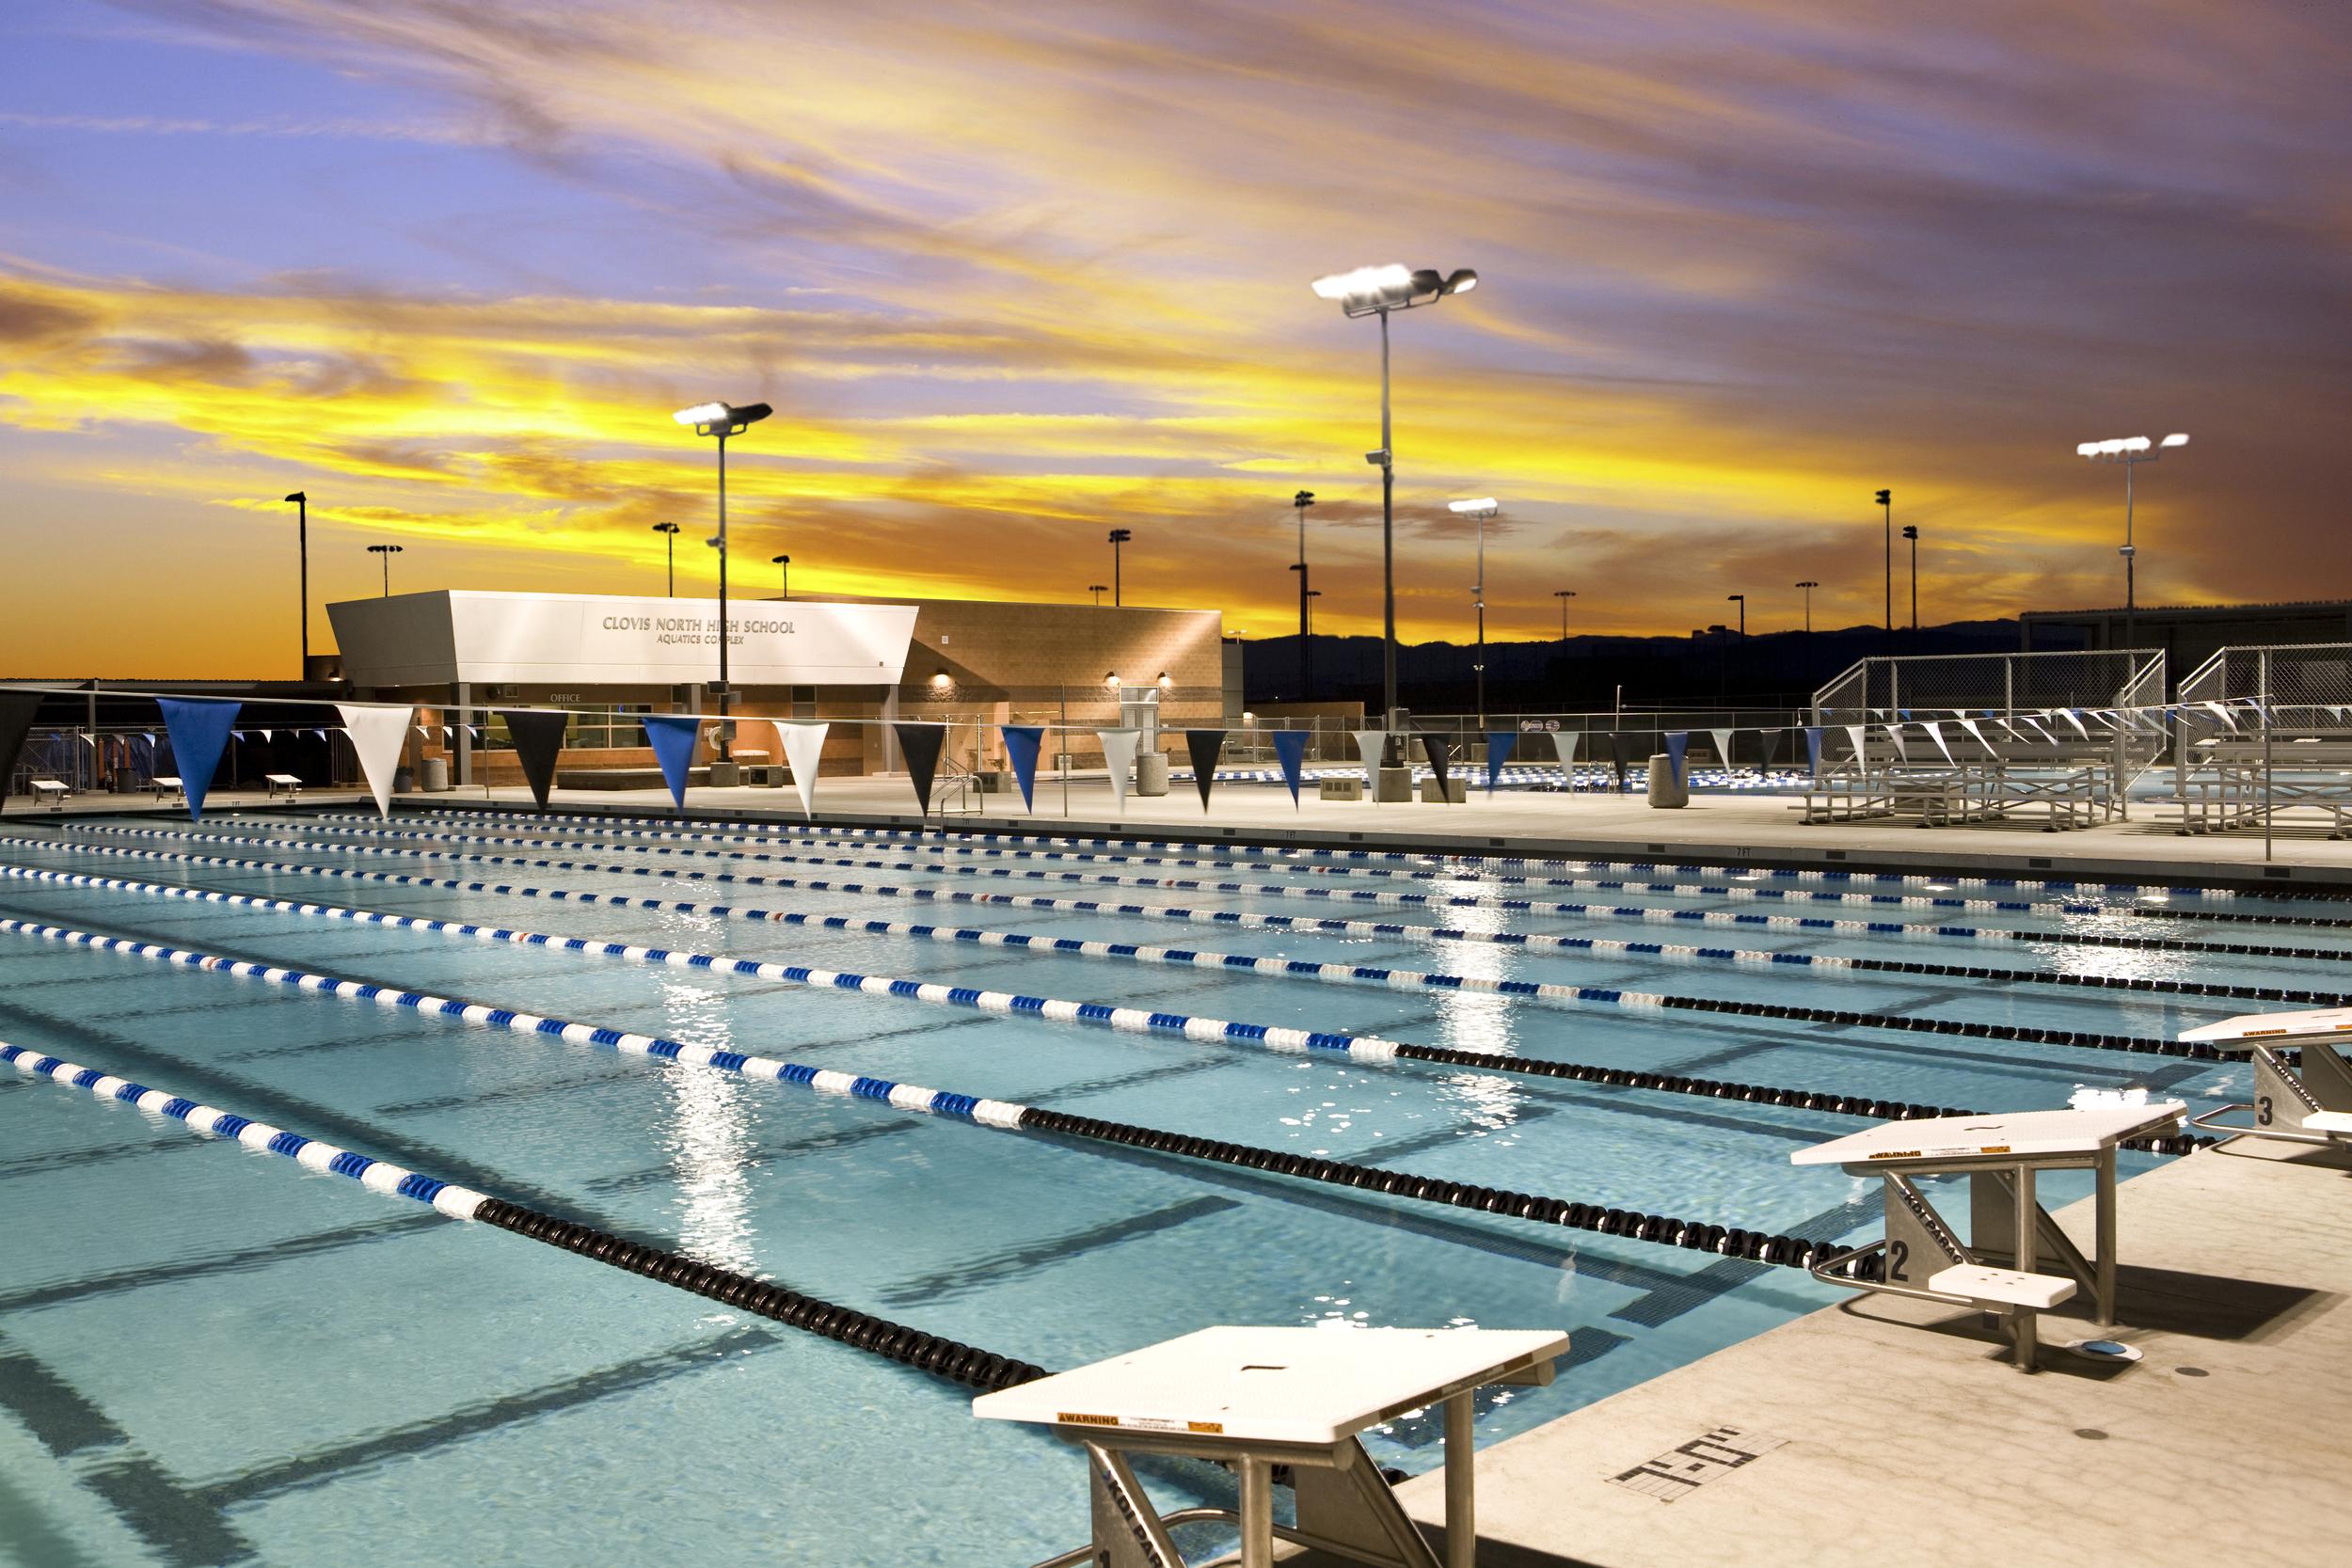 Clovis North High School Aquatics Complex, Clovis, California